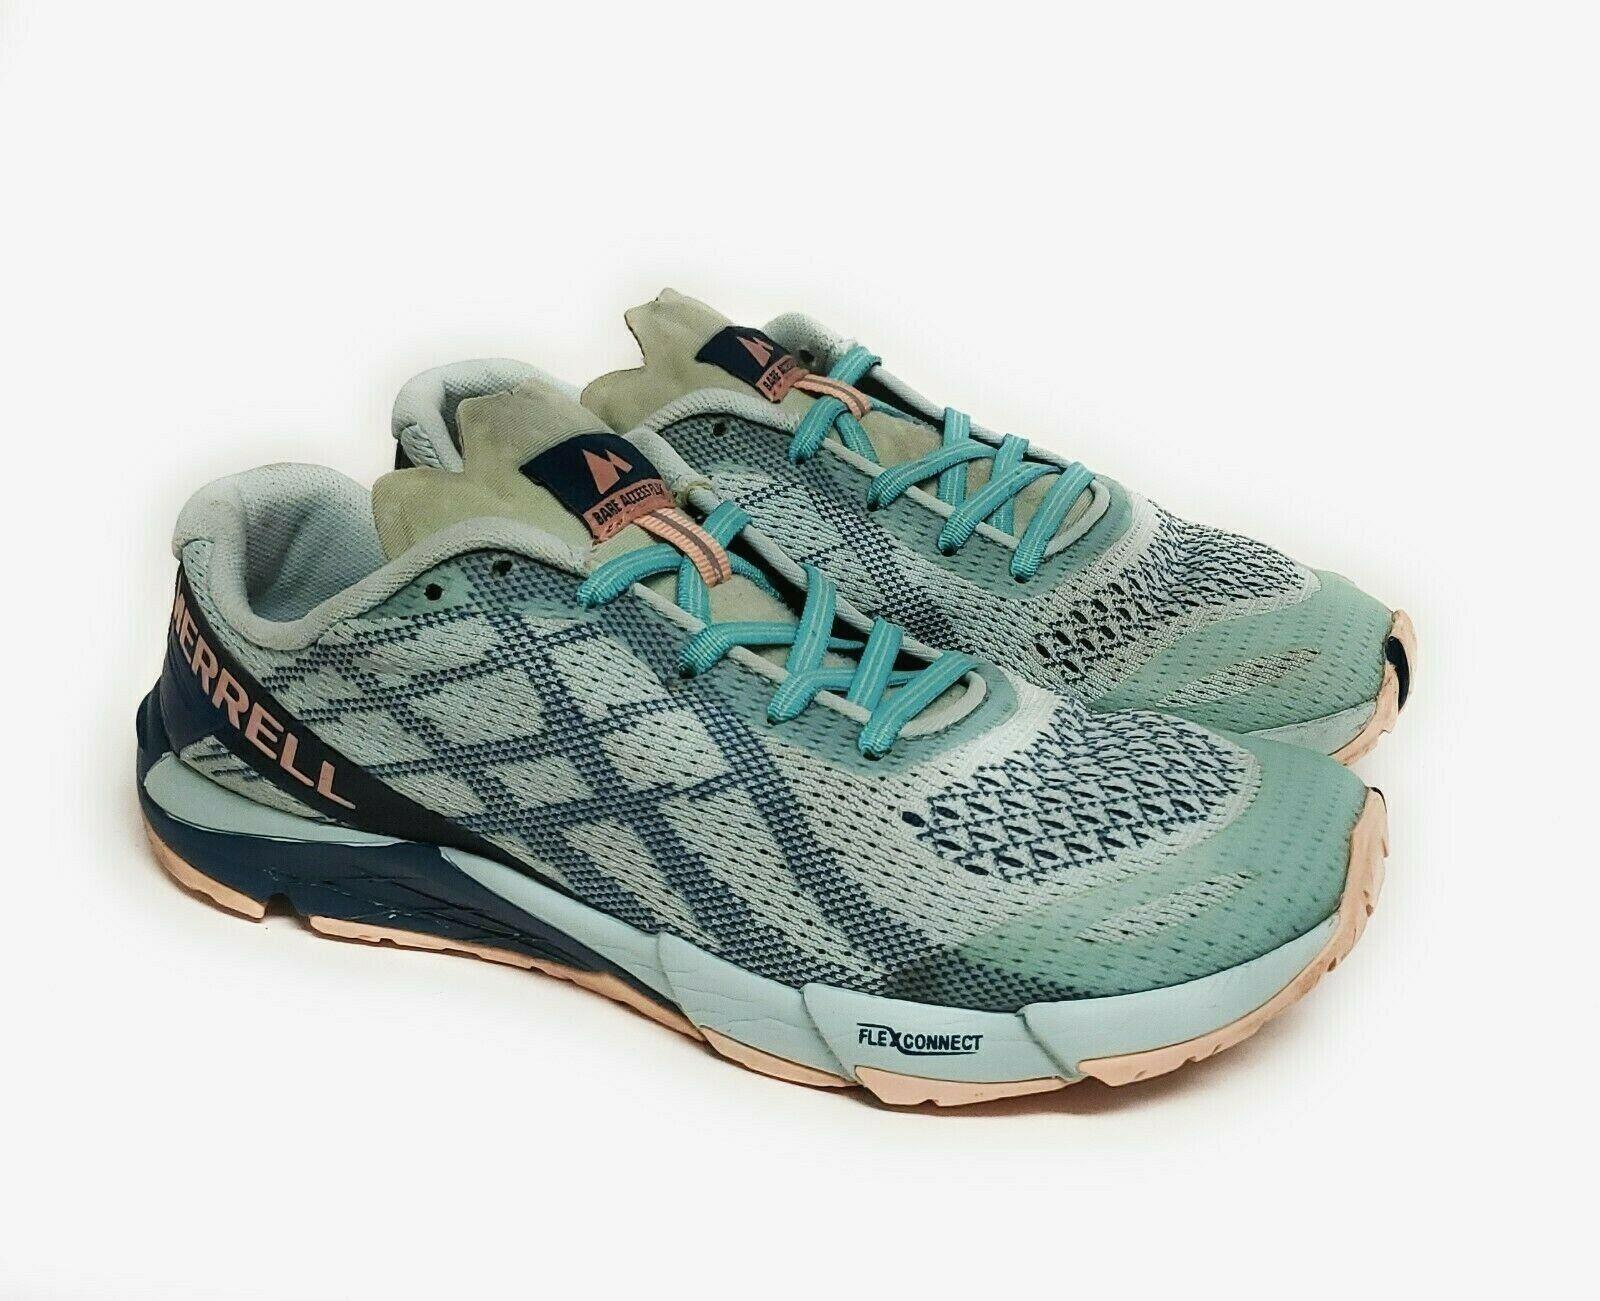 Merrell Bare Access Flex Womens Size 7.5 Trail Running Shoes J12614 - $37.95